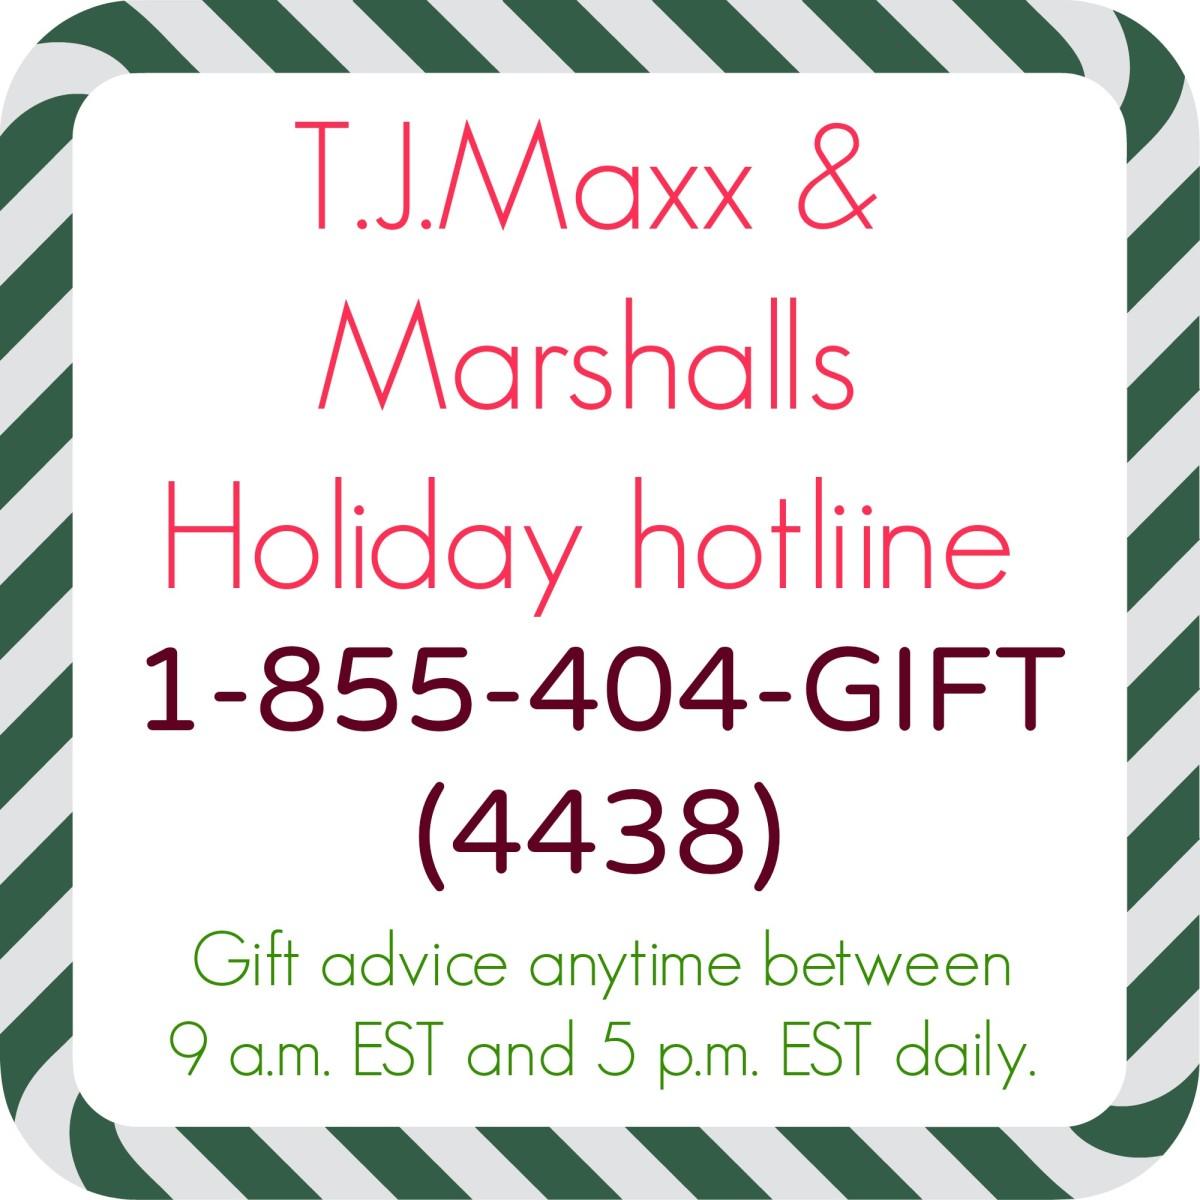 tj maxx hotline